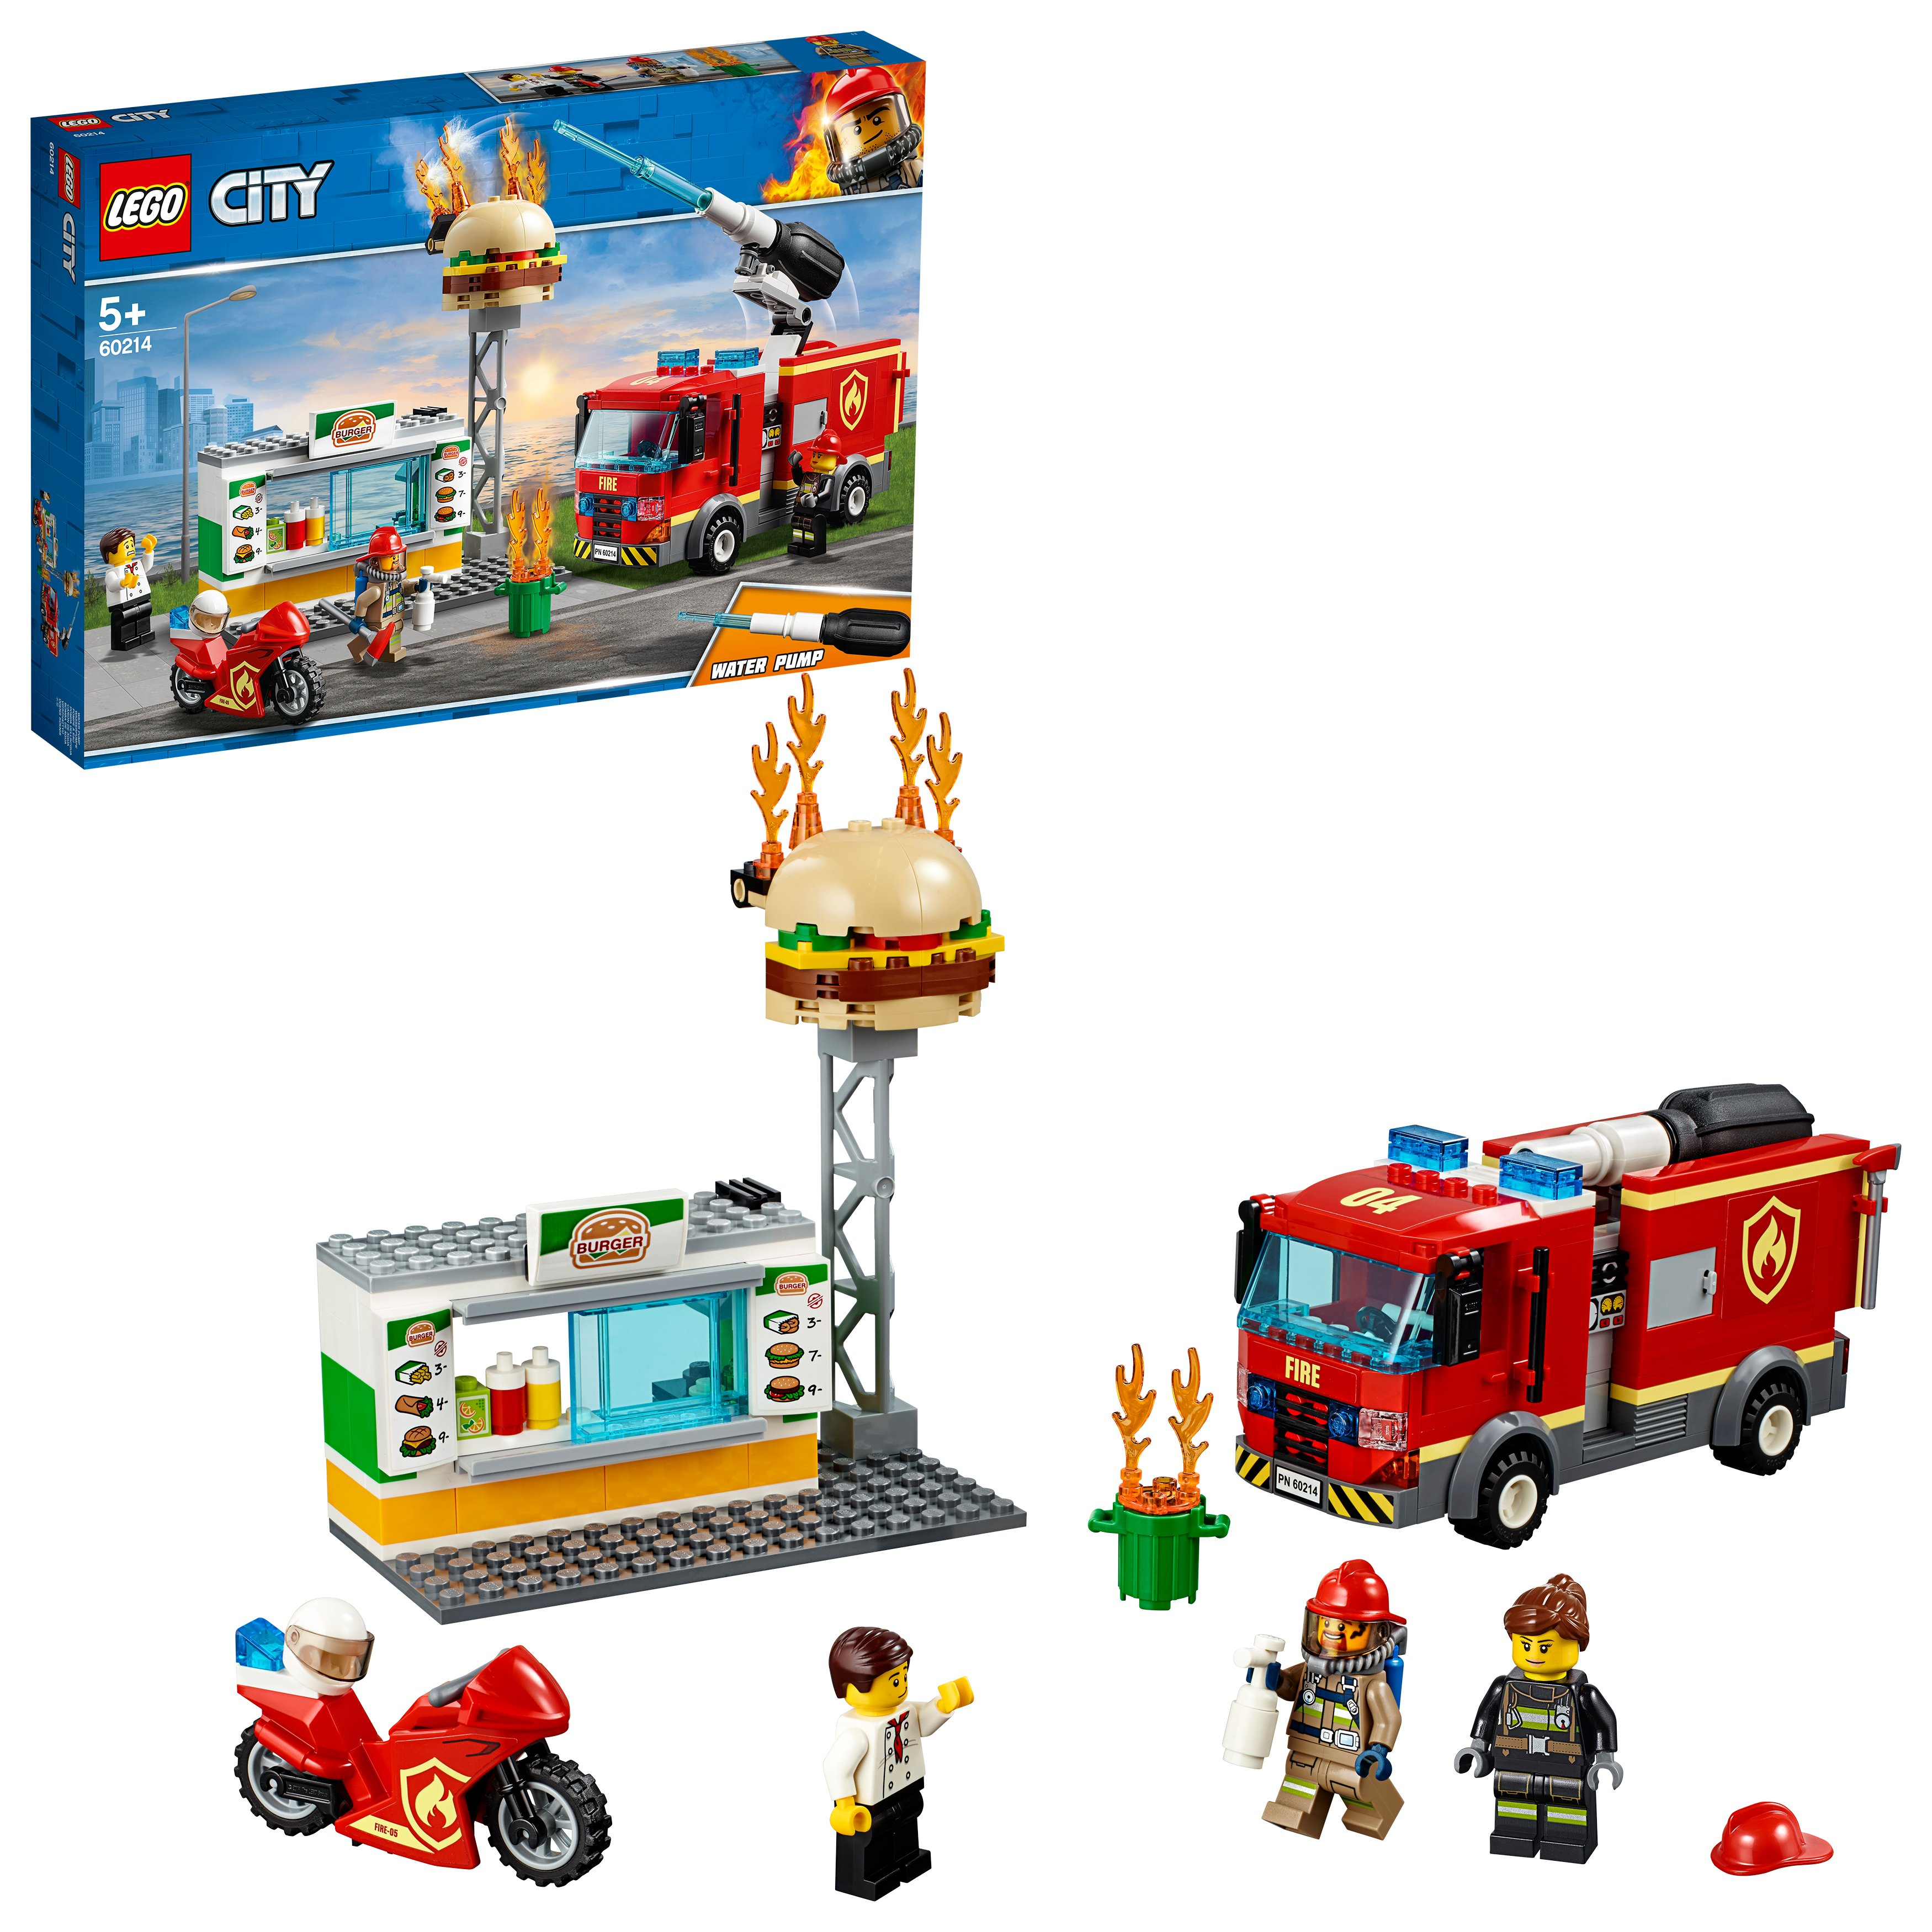 LEGO City - Burger Bar Fire Rescue (60214)